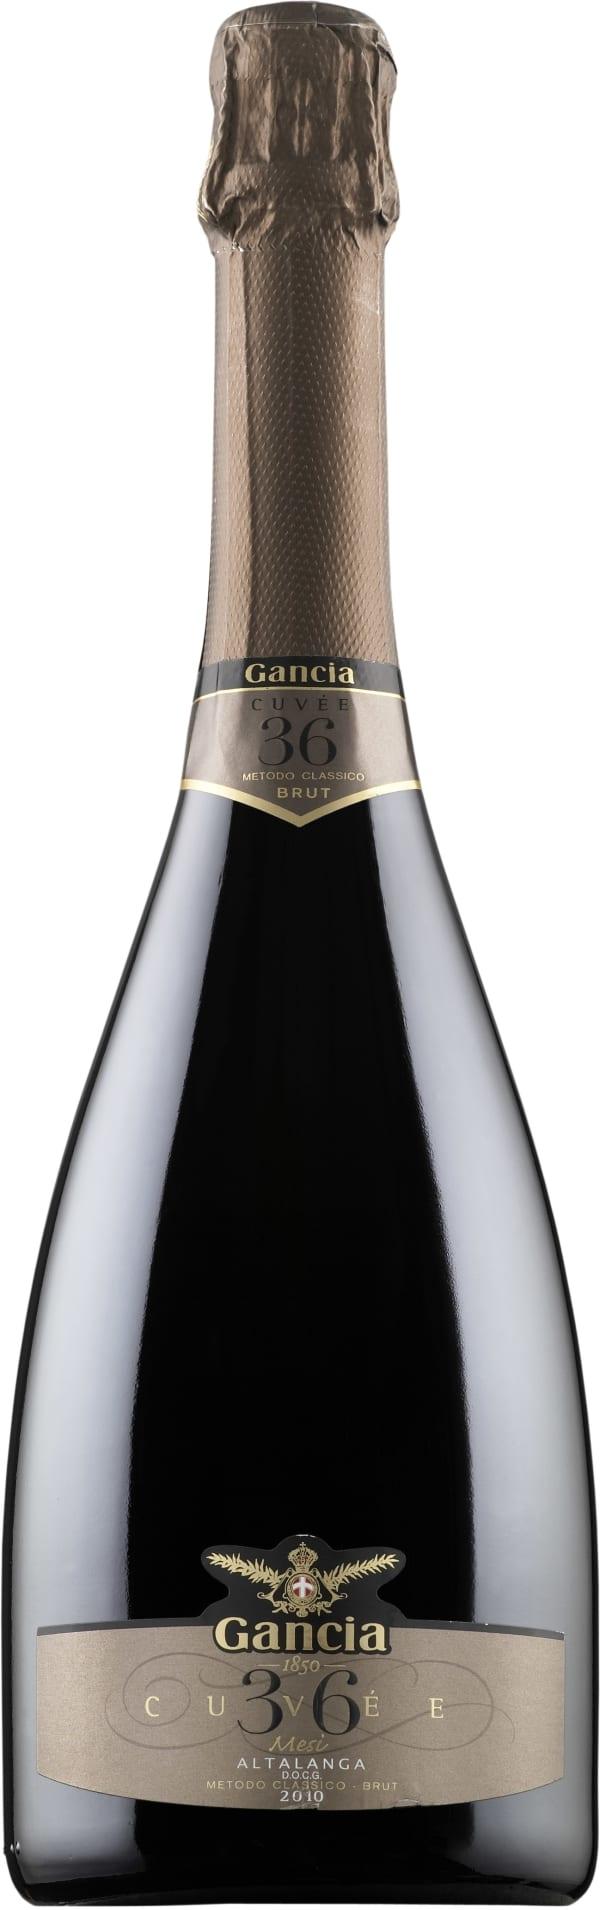 Gancia Cuvée 36 Mesi Brut 2010